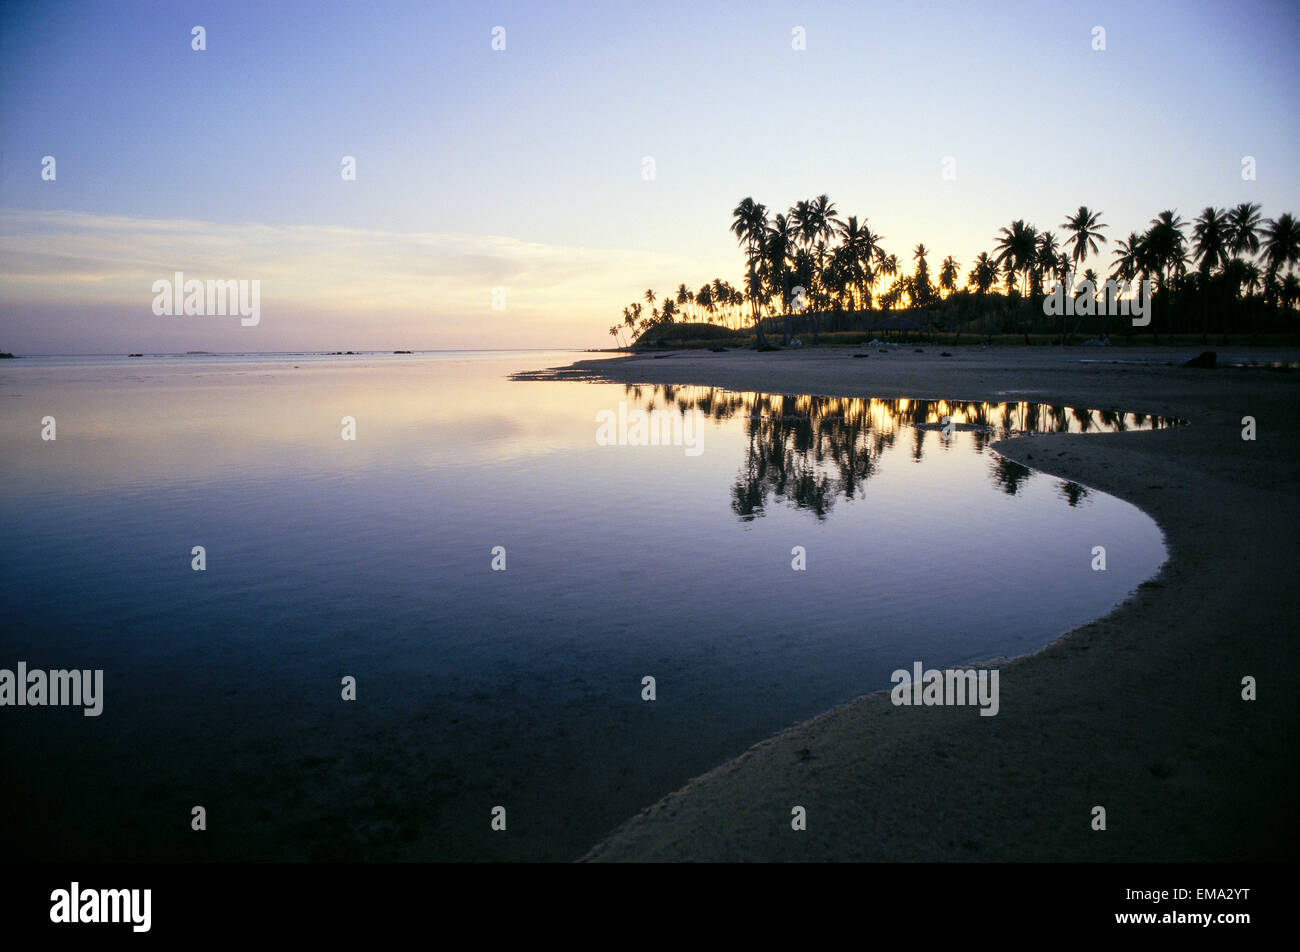 Fiji, Islas Mamanuca, a Malololailai Isla, atardecer tropical a lo largo de la costa de aguas tranquilas Palmeras Imagen De Stock